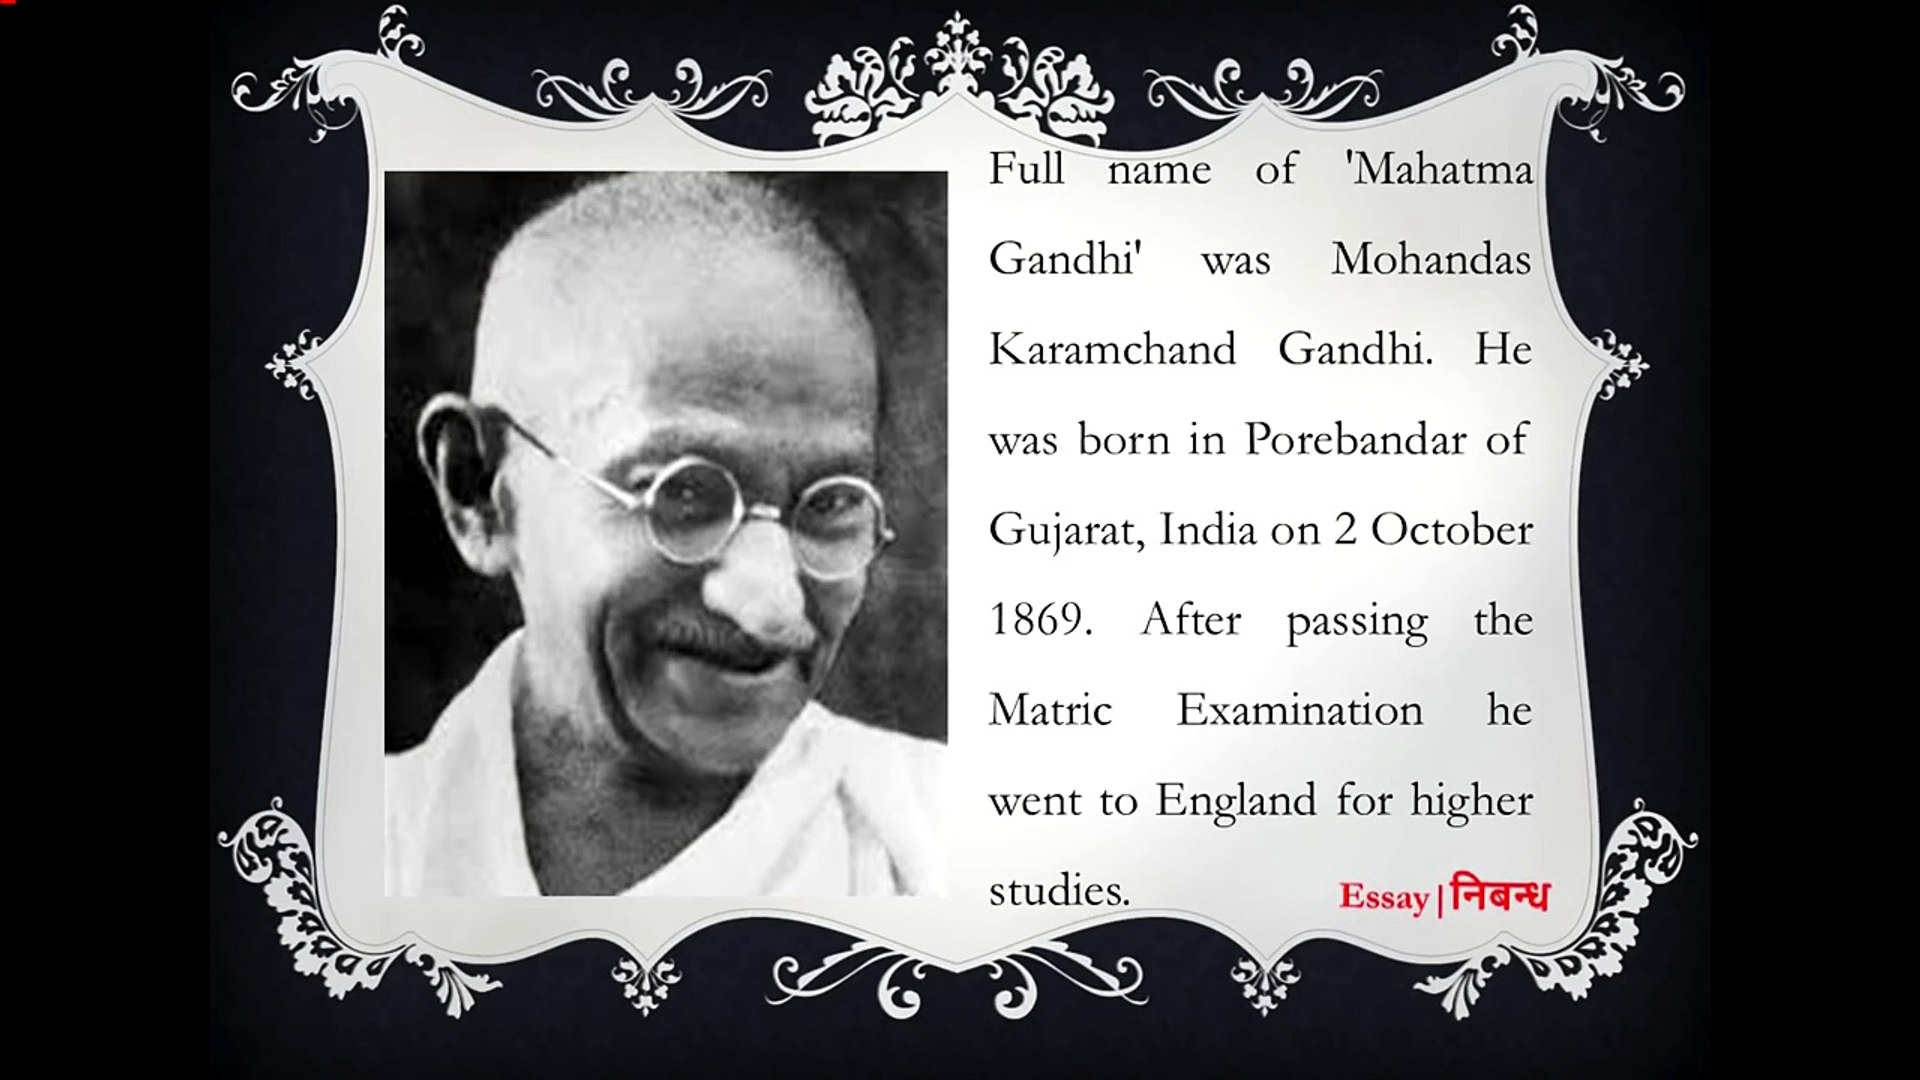 an essay on mahatma gandhi in english language